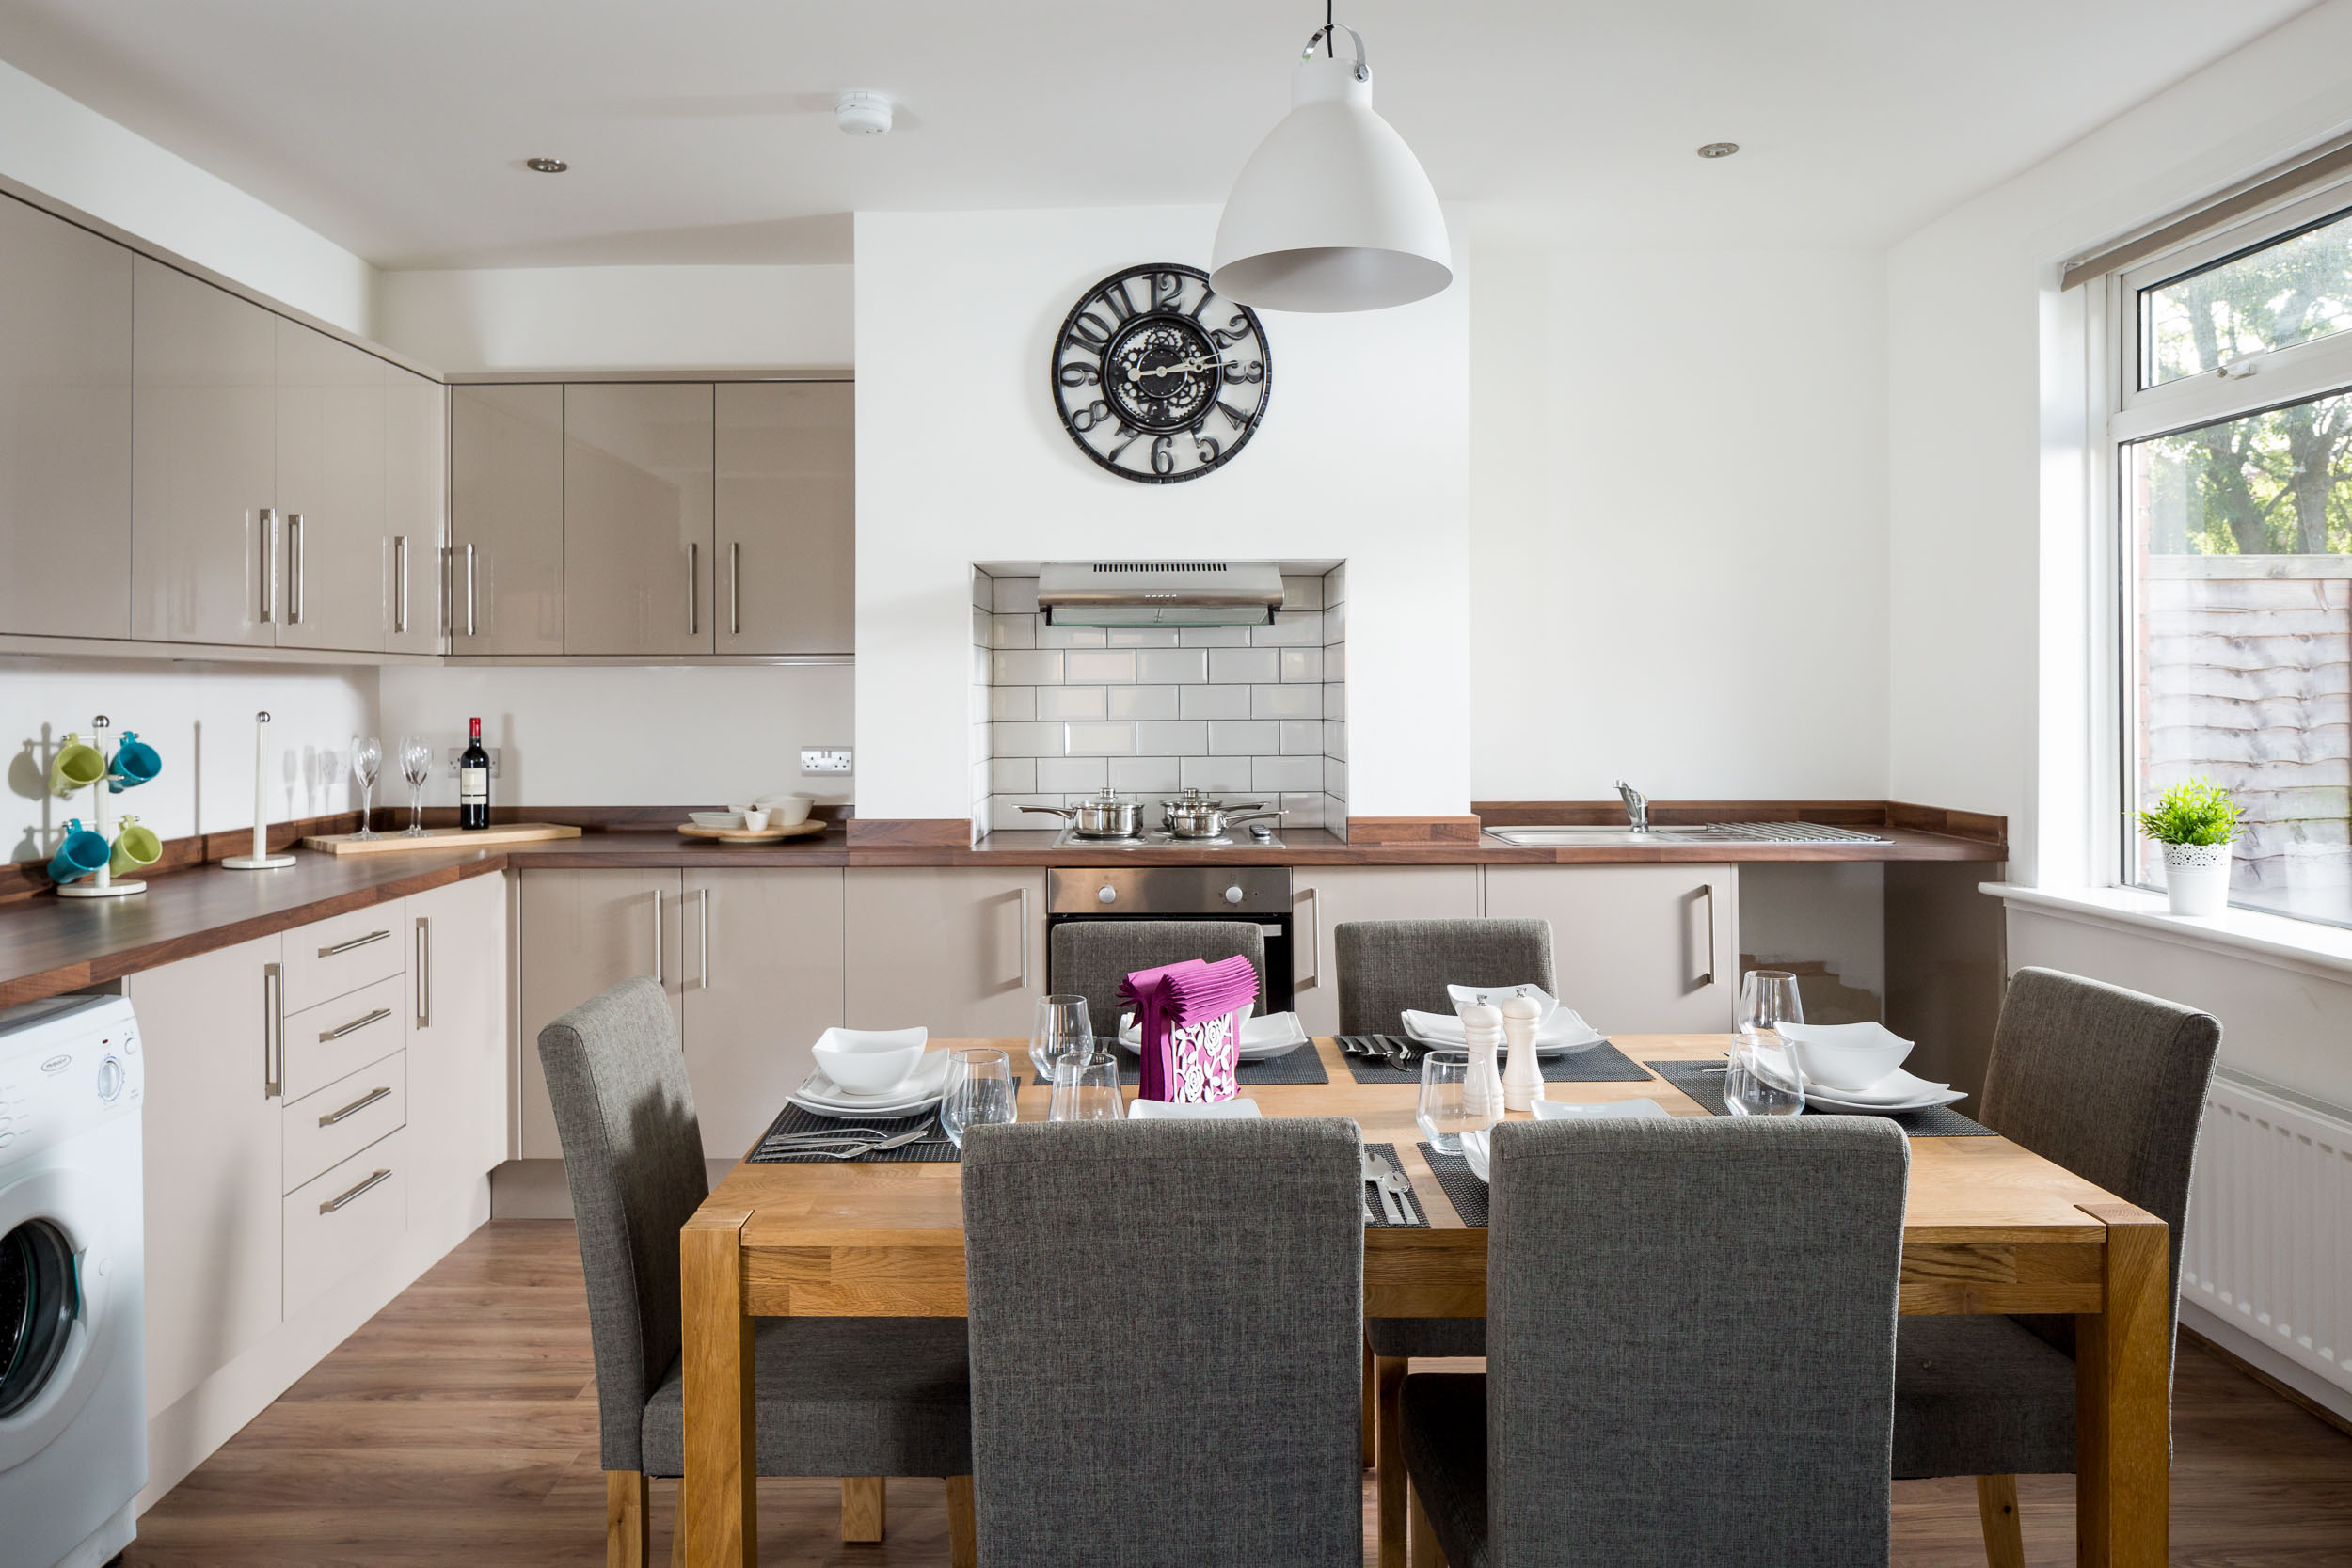 leeds restidential property kitchen interior after.jpg